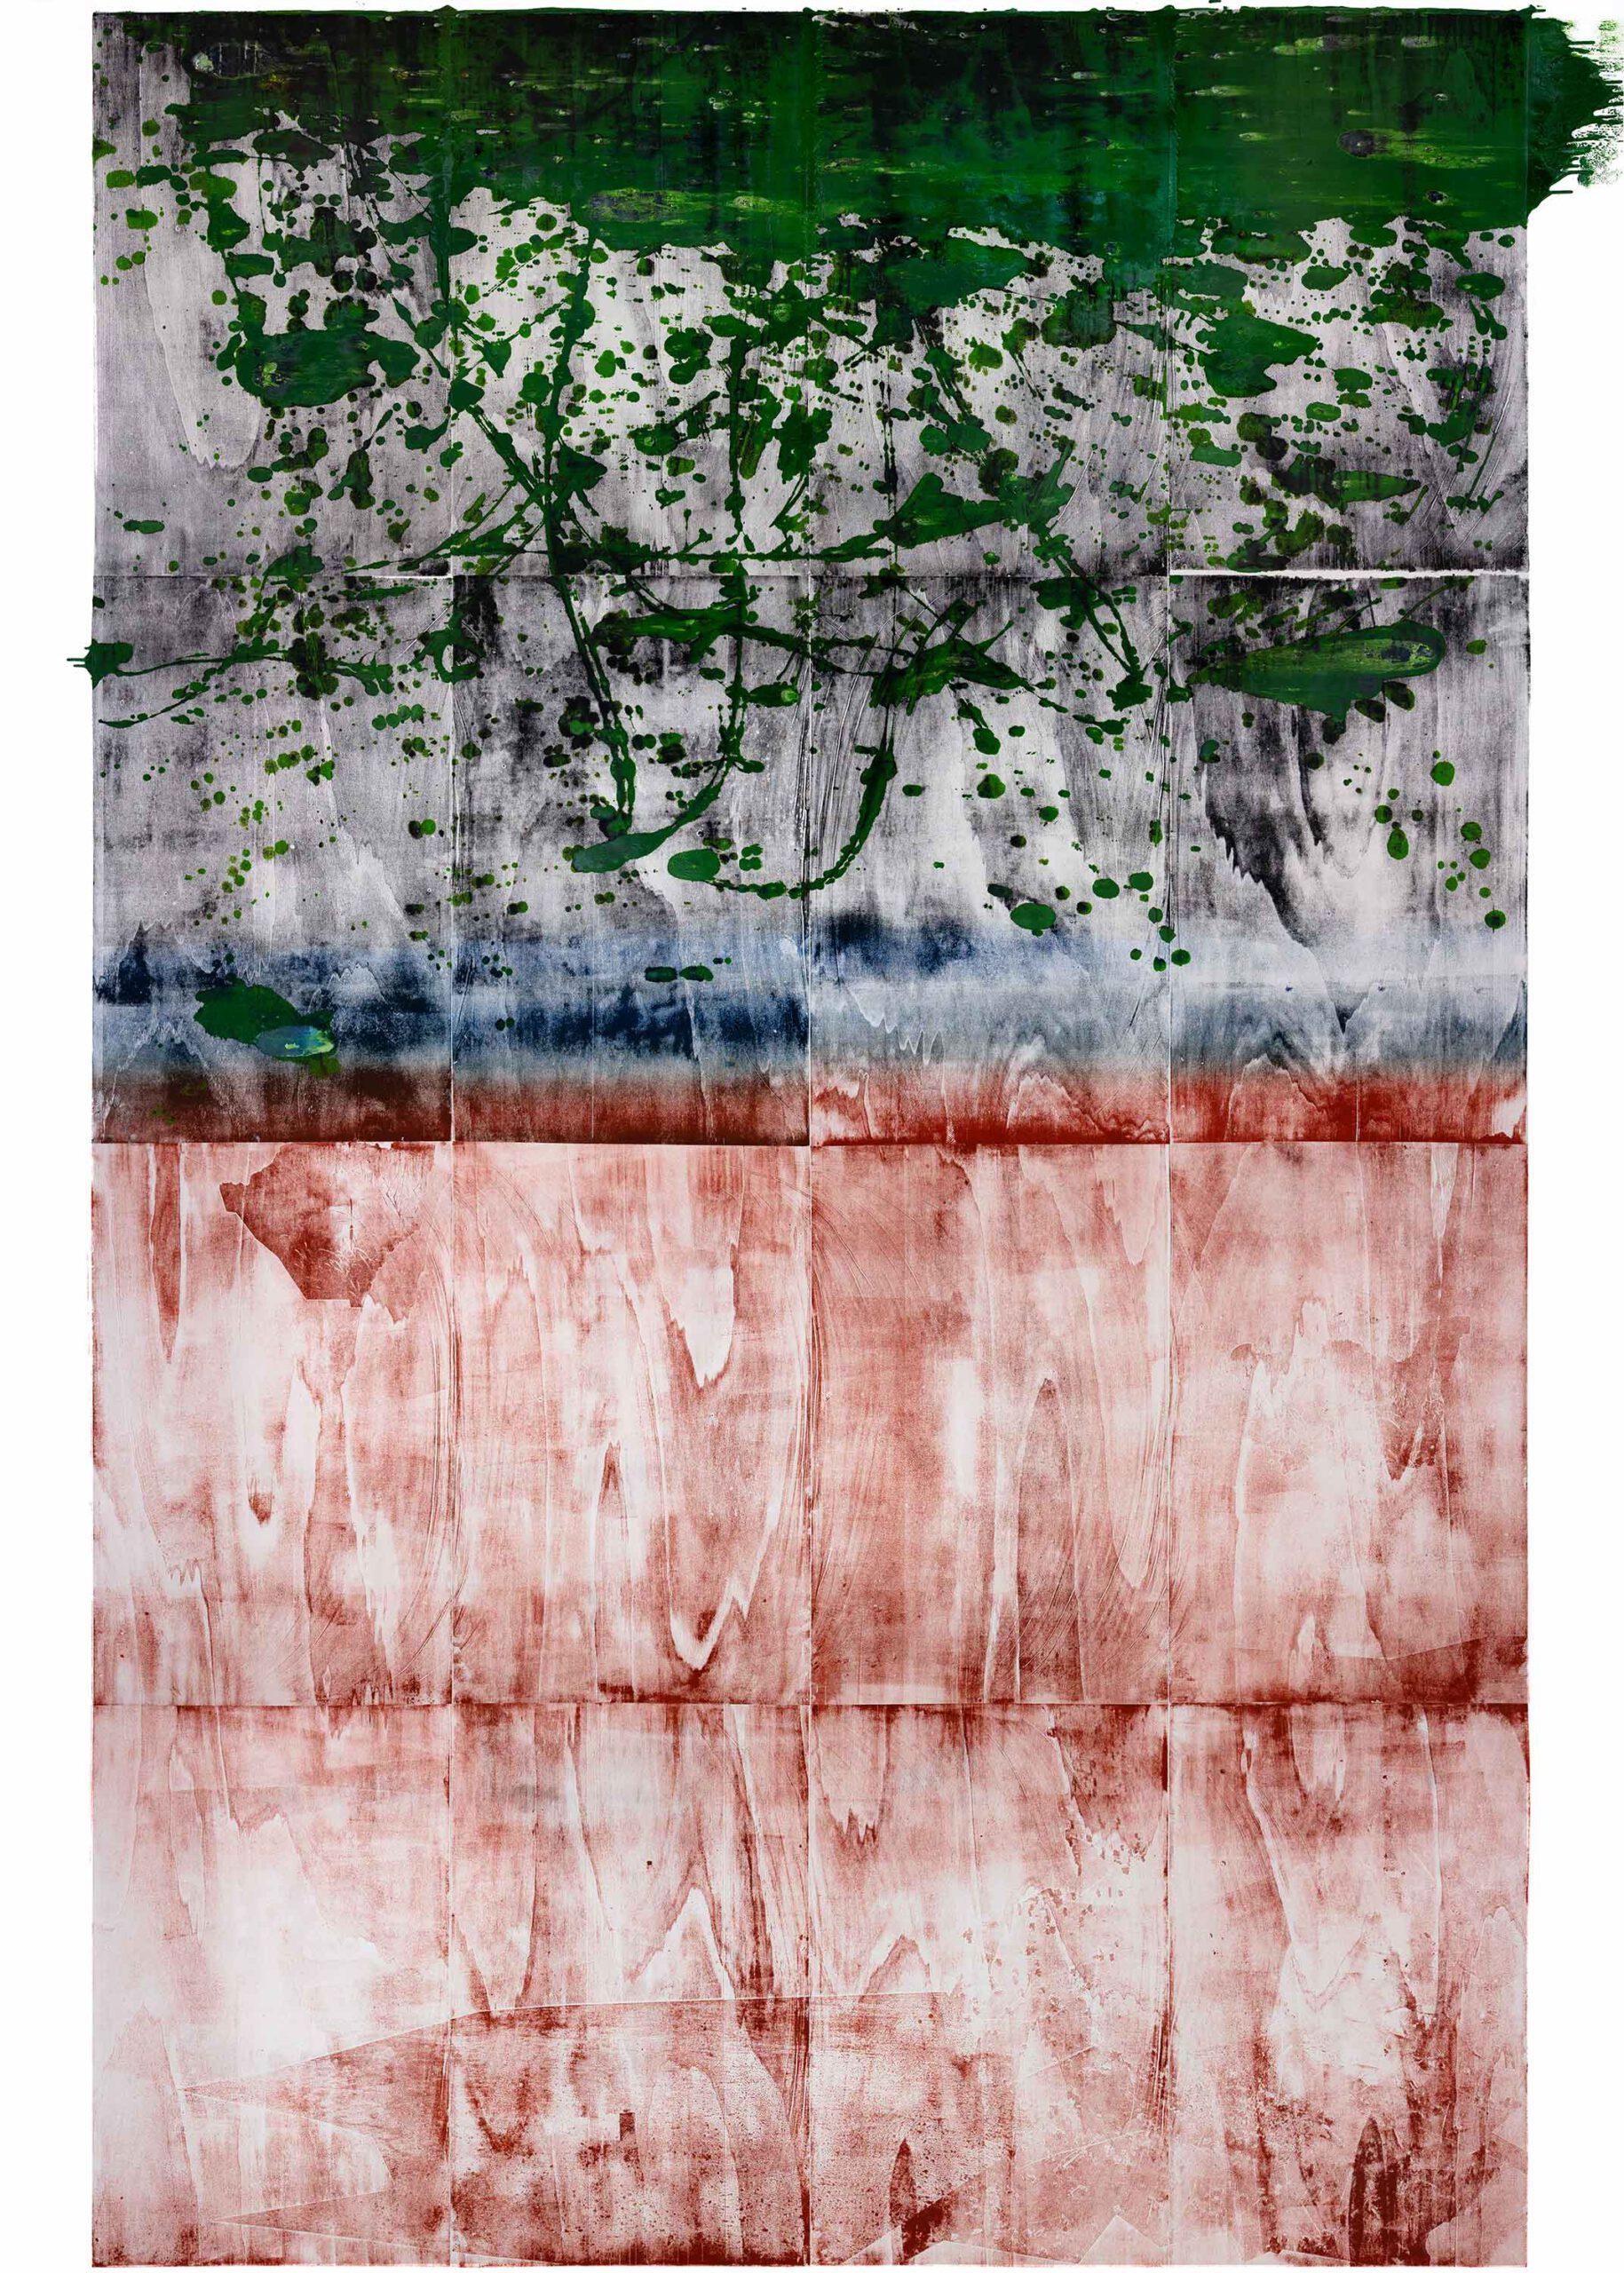 Sehr alter Traum Fortsetzung, 2020, wood engraving, 398 x 285,5 cm